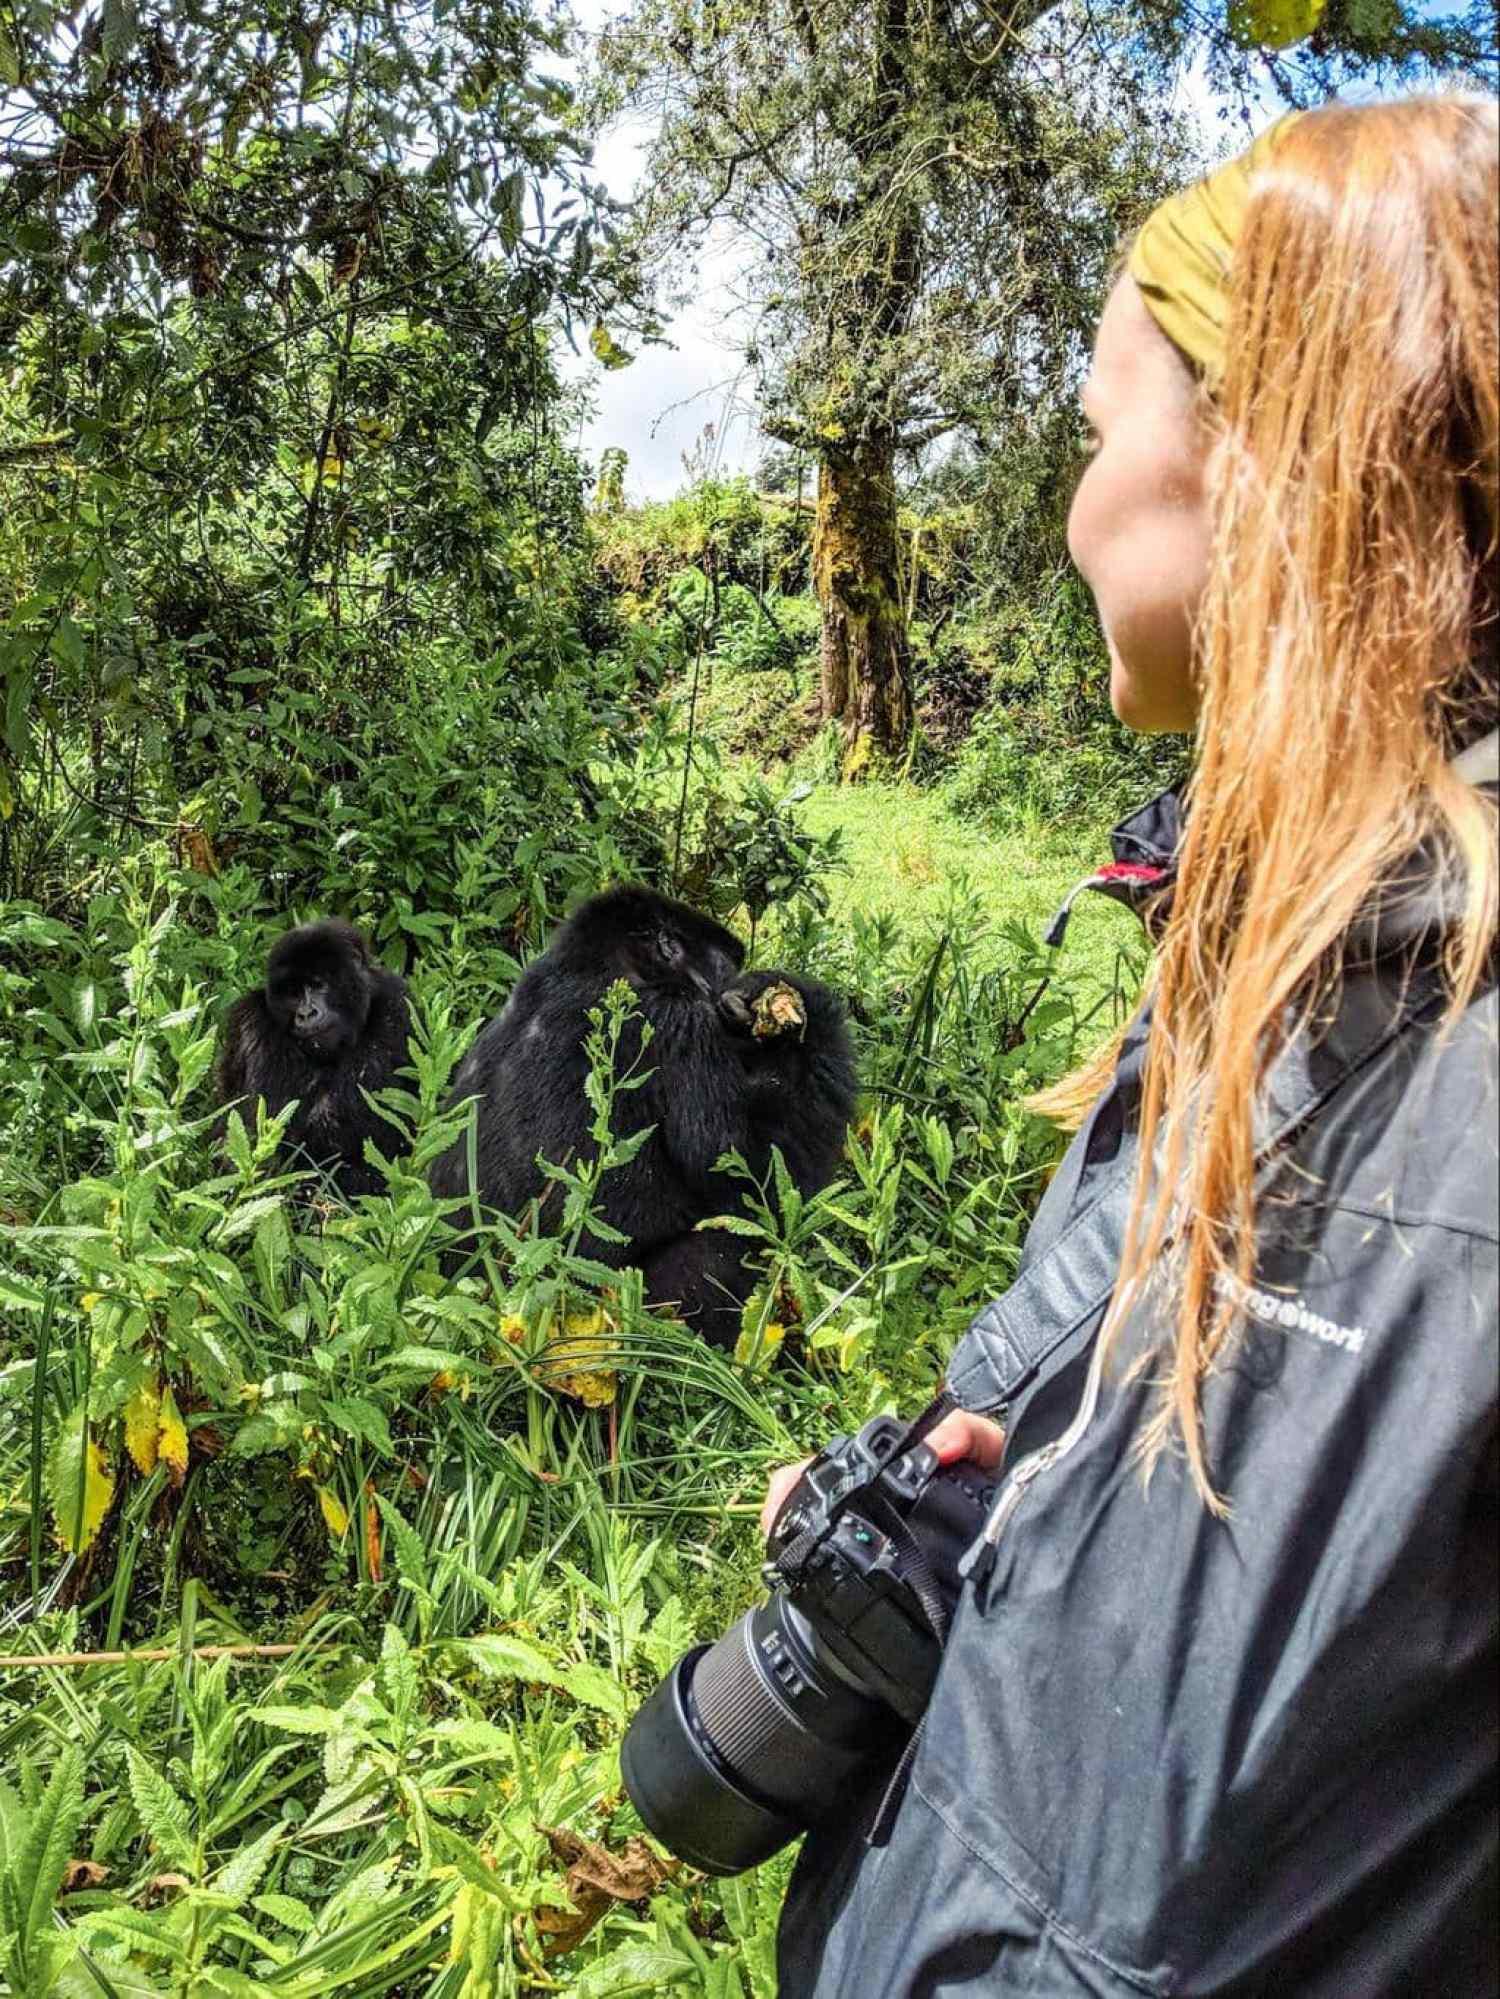 Seeing the gorillas in the sun